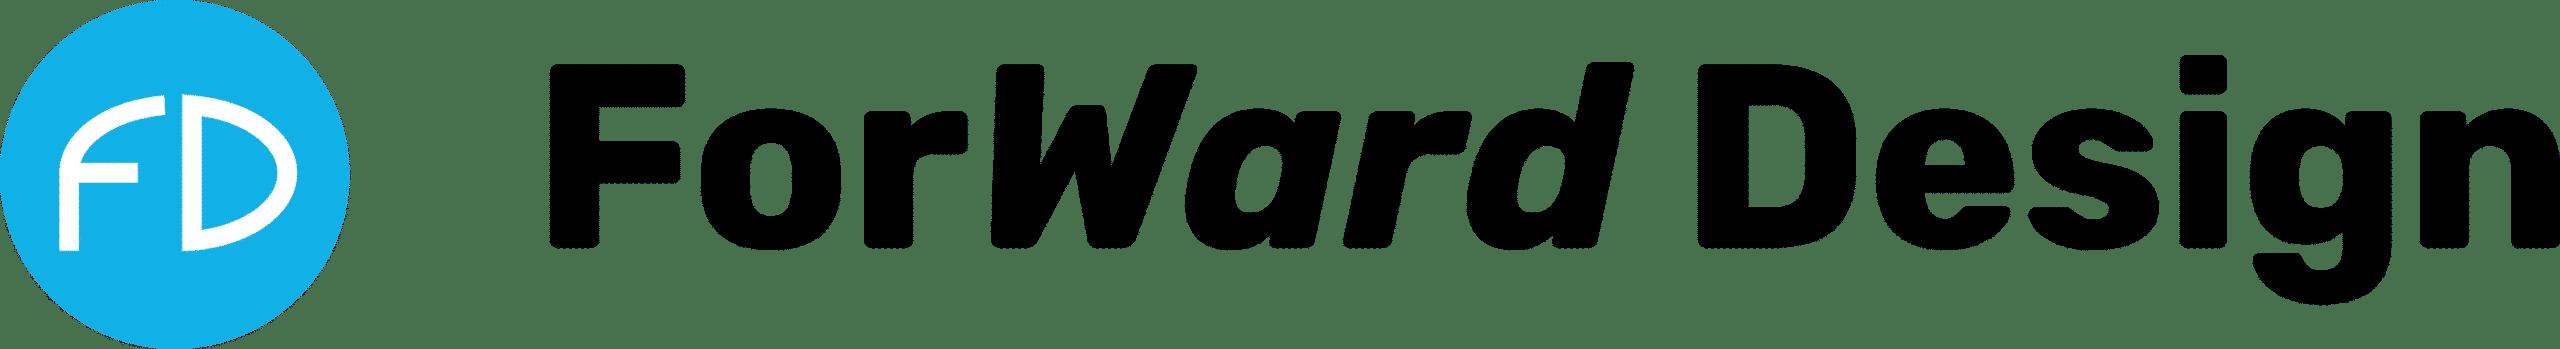 ForWard_Design_Logo_Circle_Banner_128px_height